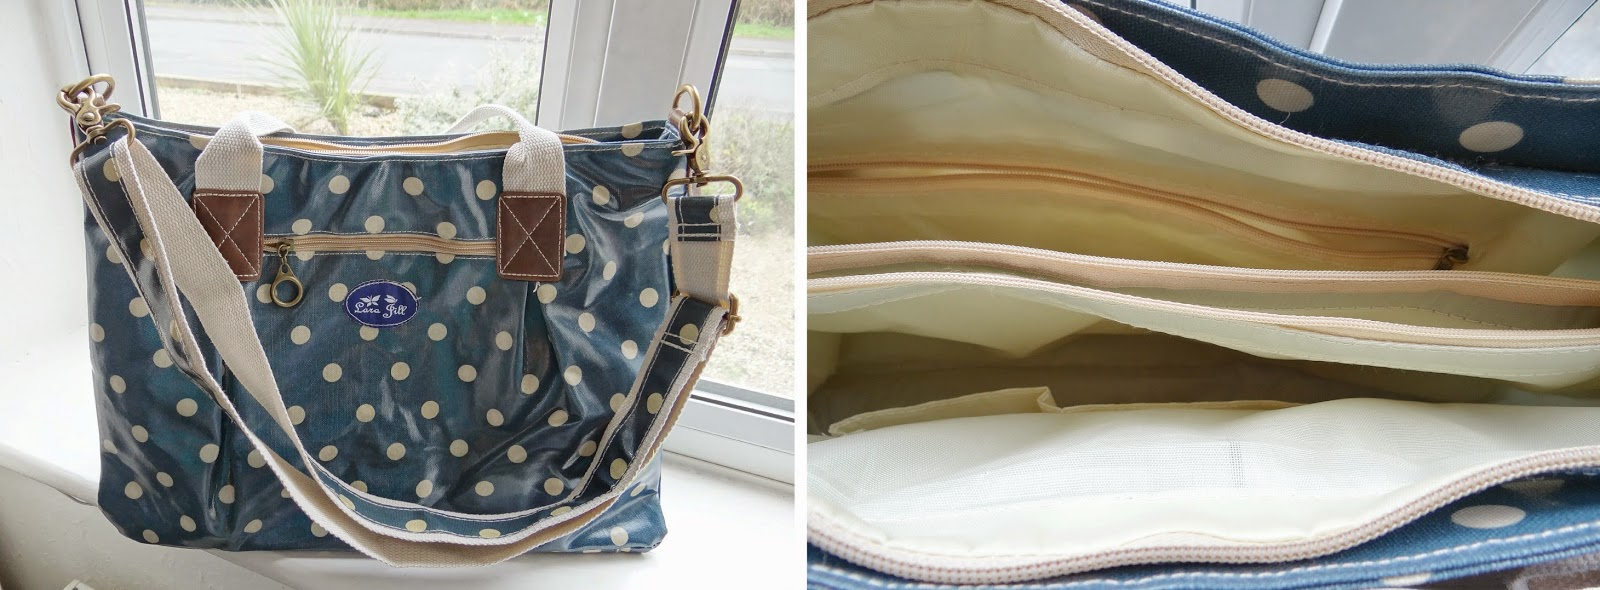 Lara Jill Handbag, polka dots handbag, vintage style tote